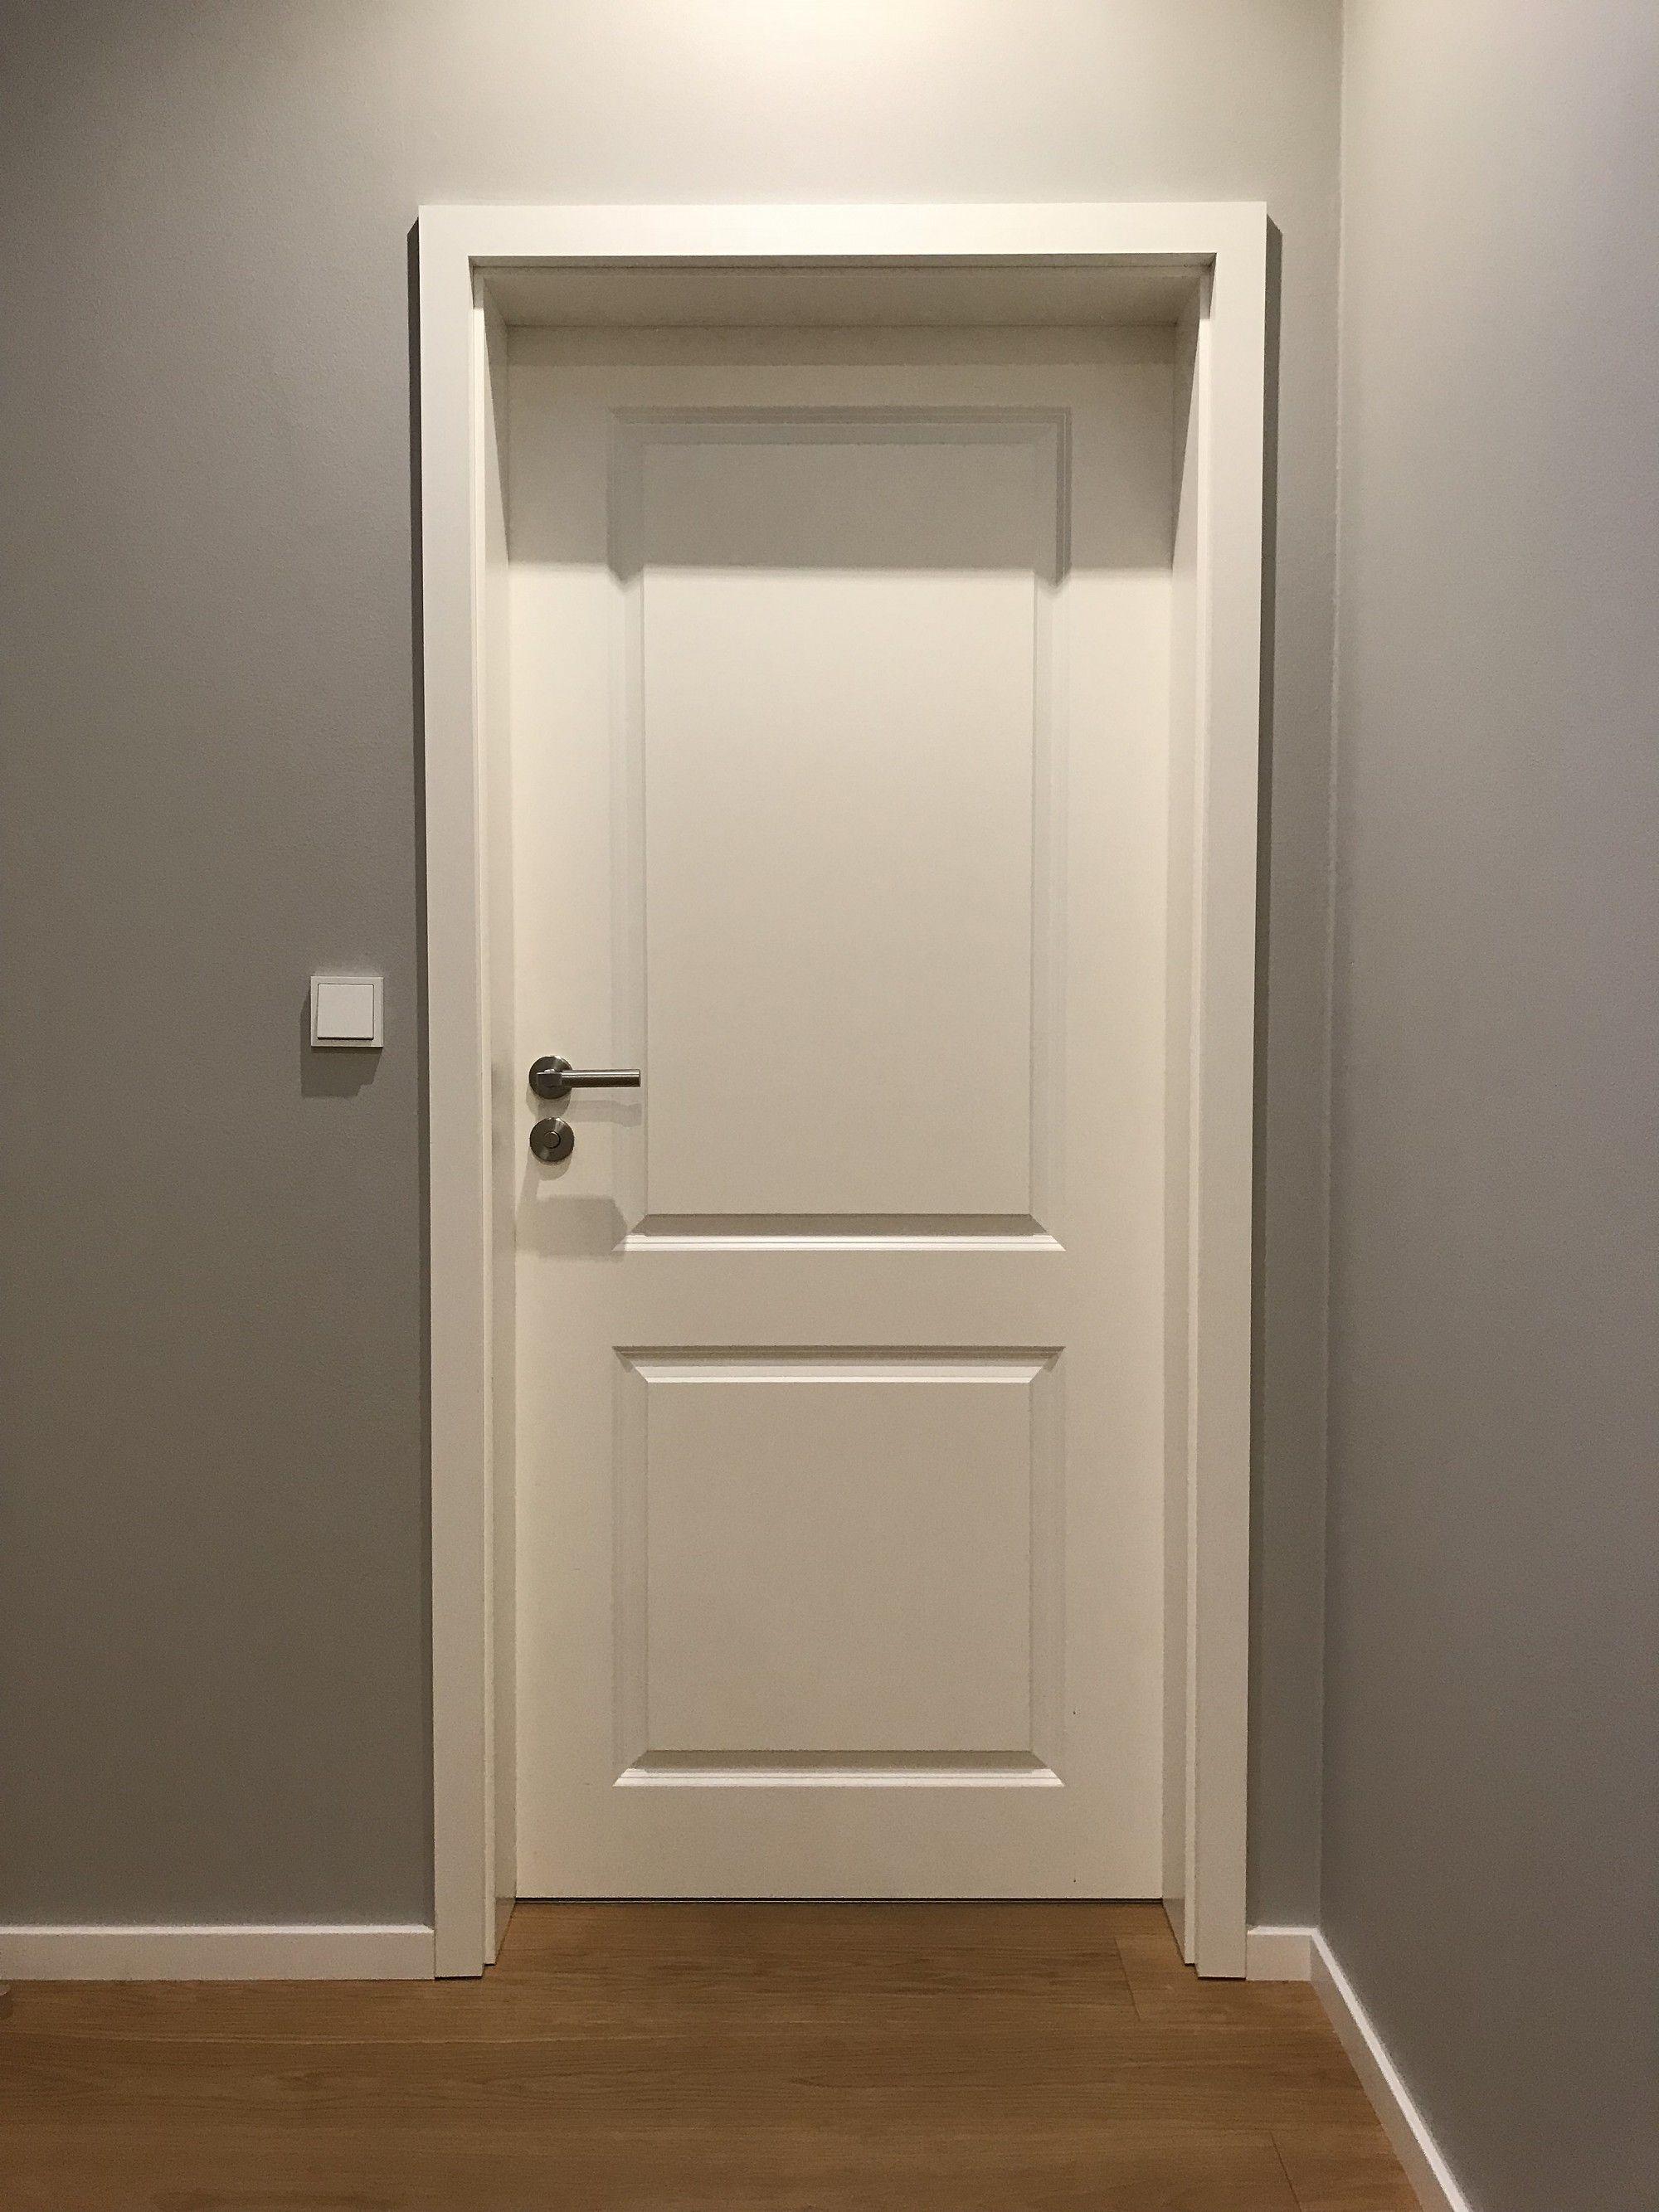 Objektbau, Türen, Fenster, Möbel, Instandsetzung